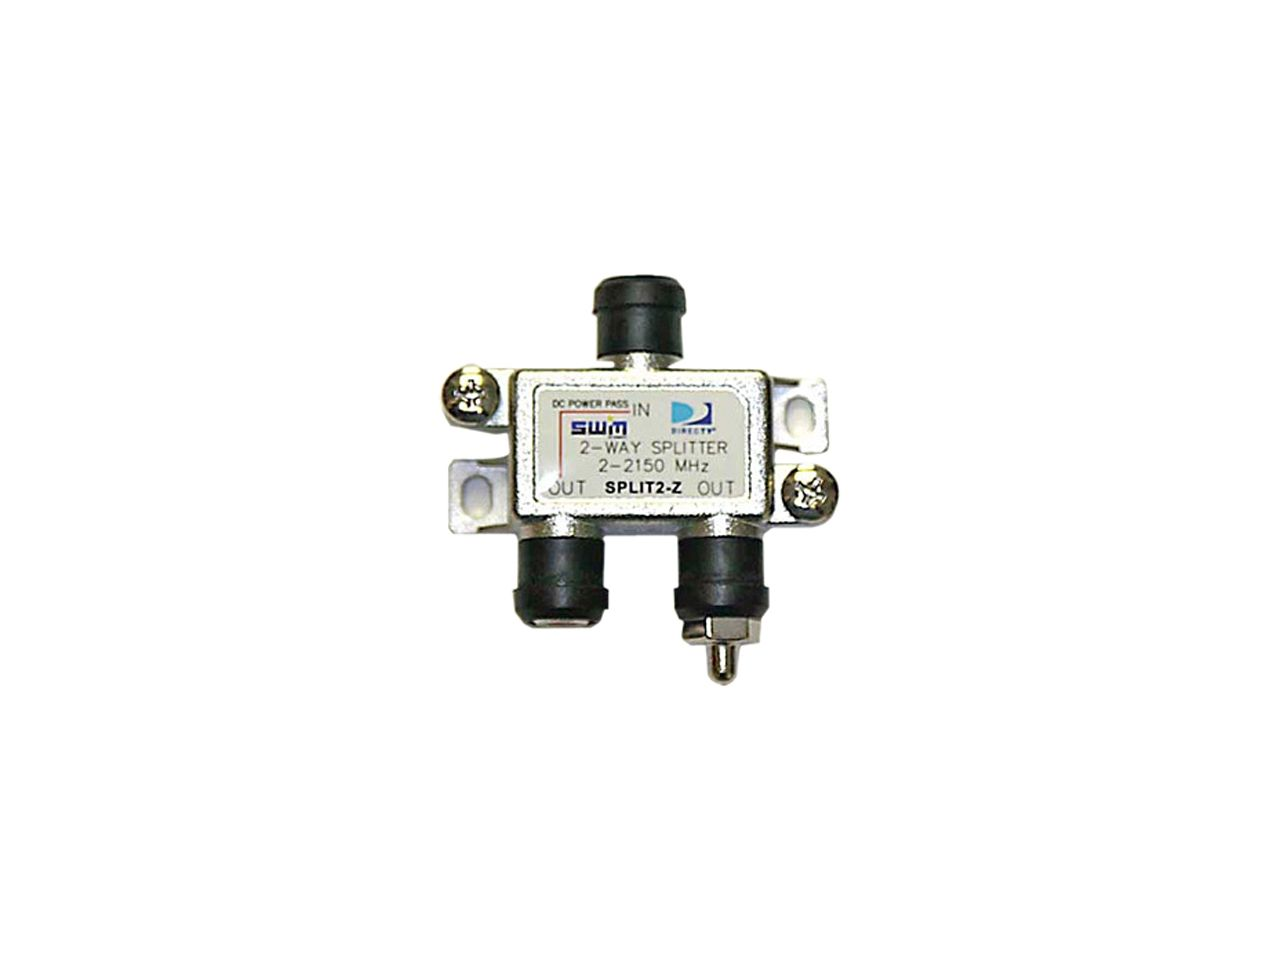 DIRECTV SPLIT2 SWM 2 Way Splitter 2-2150 Mhz 1 Port Power